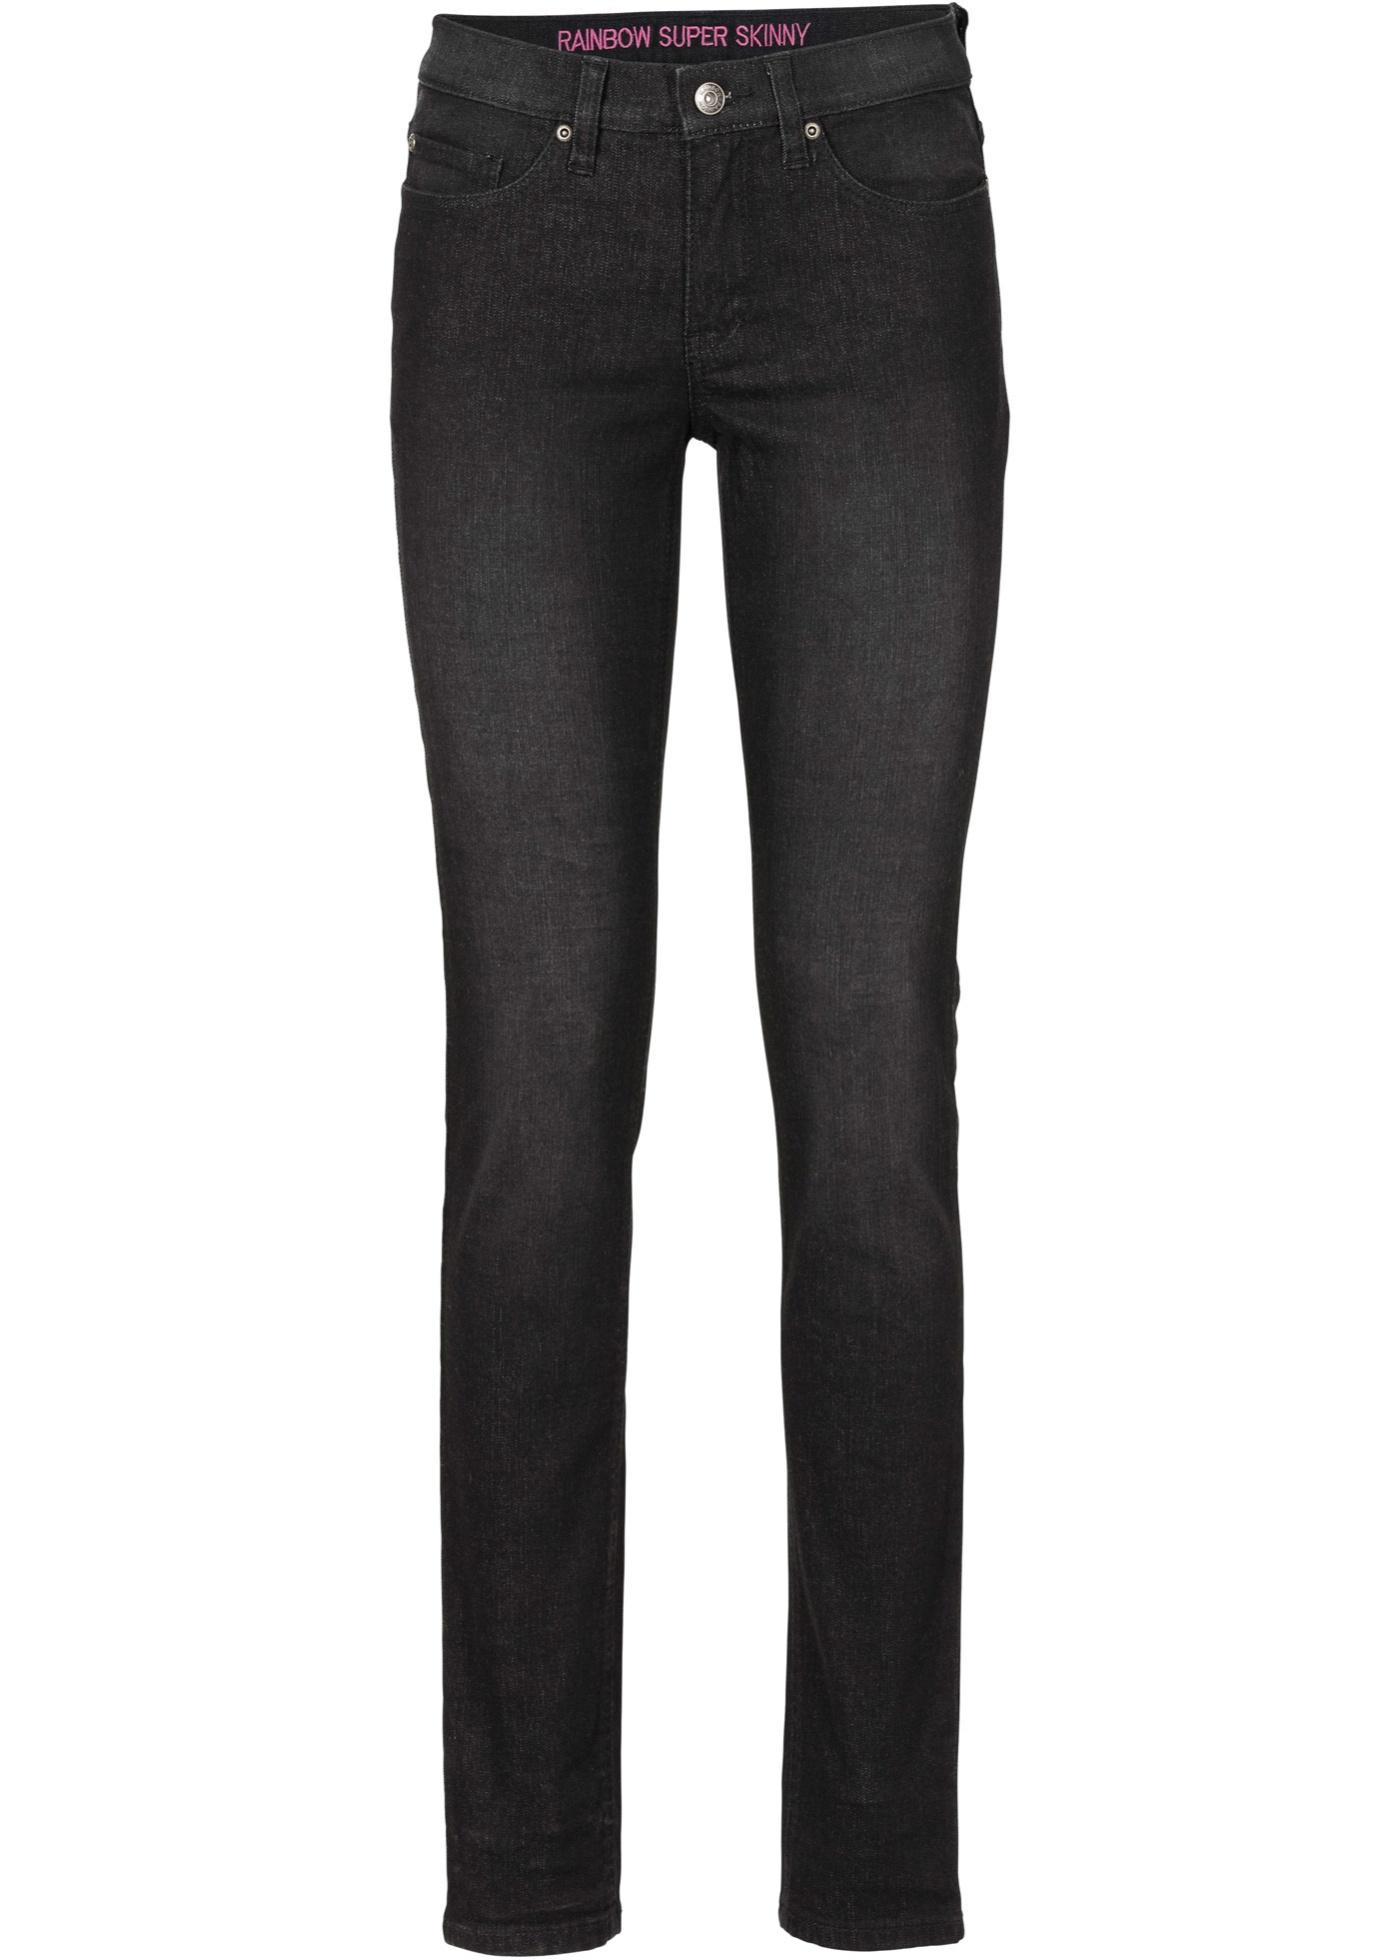 Bonprix - Jeans, super skinny 299.00